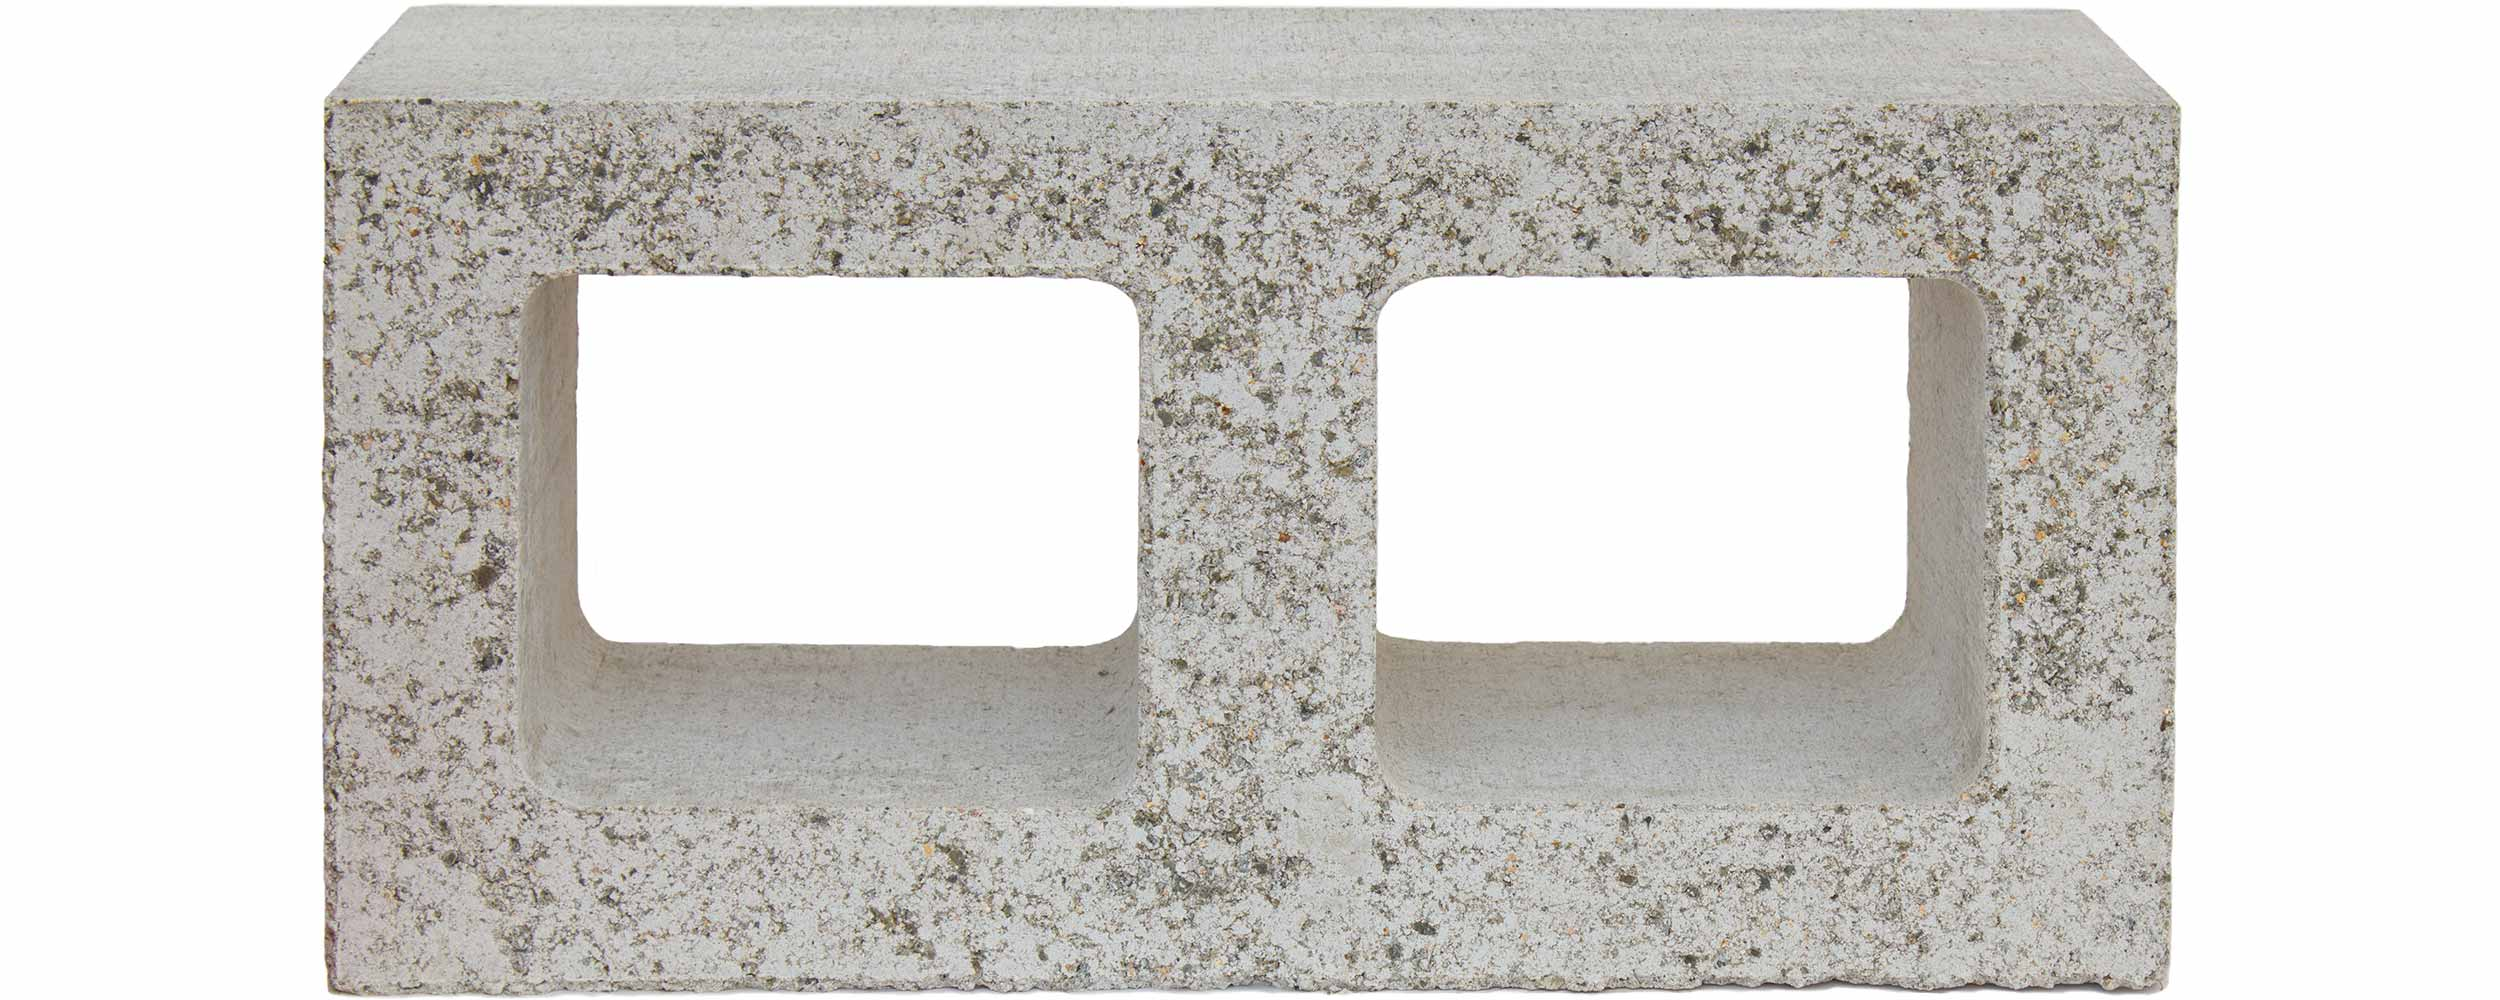 Watershed-Materials-White-Watershed-Block-2-2500.jpg